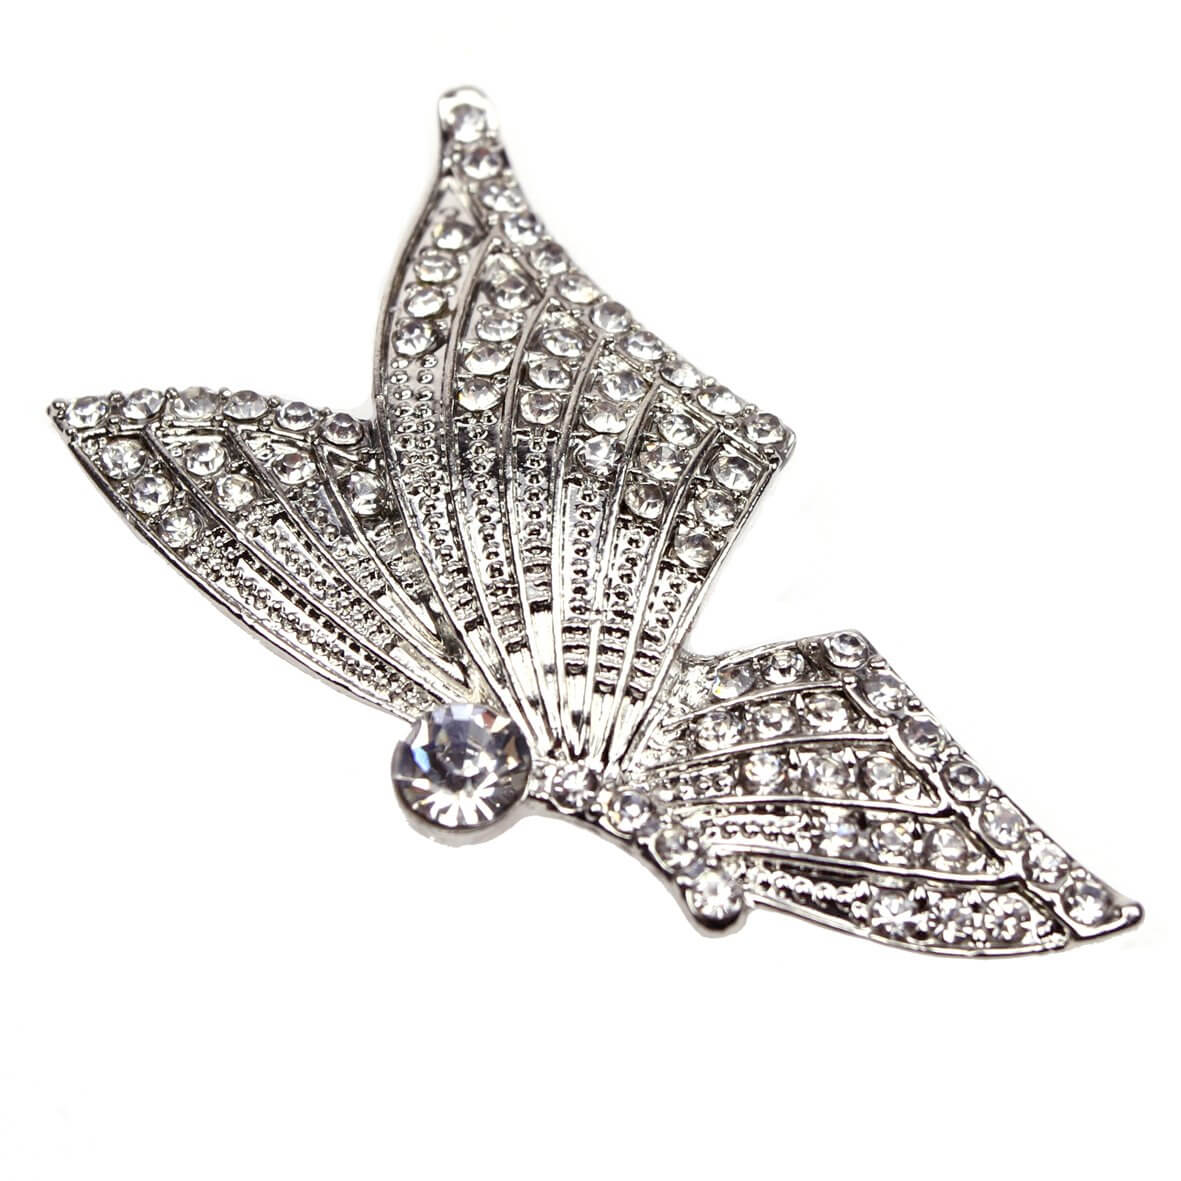 Mariposa - a diamante butterfly embellishment